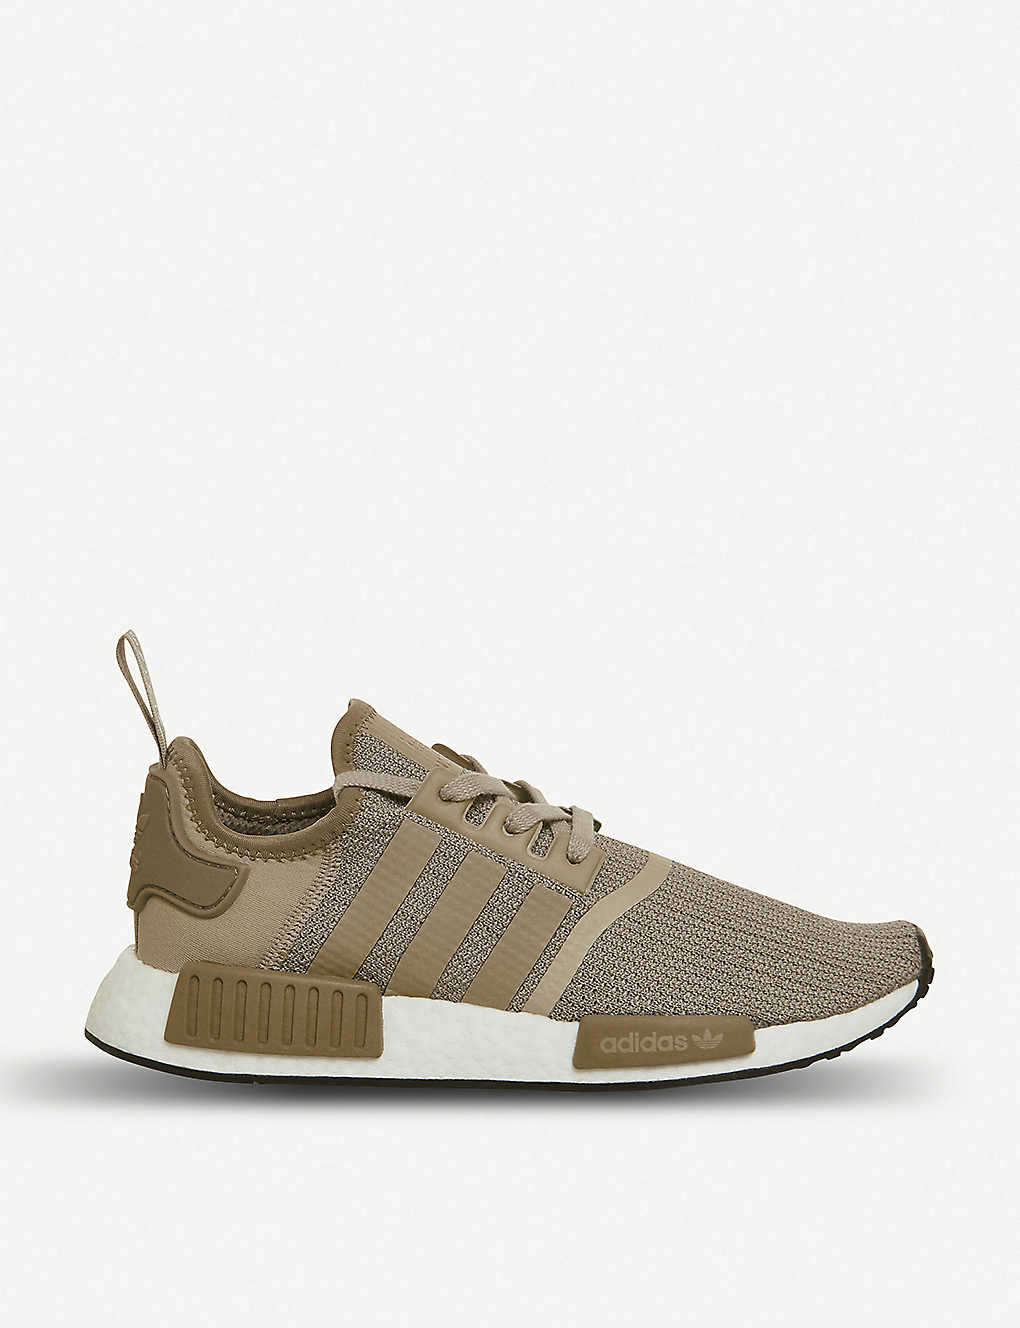 f6aee3a094f9 ADIDAS - Nmd r1 Primeknit sneakers